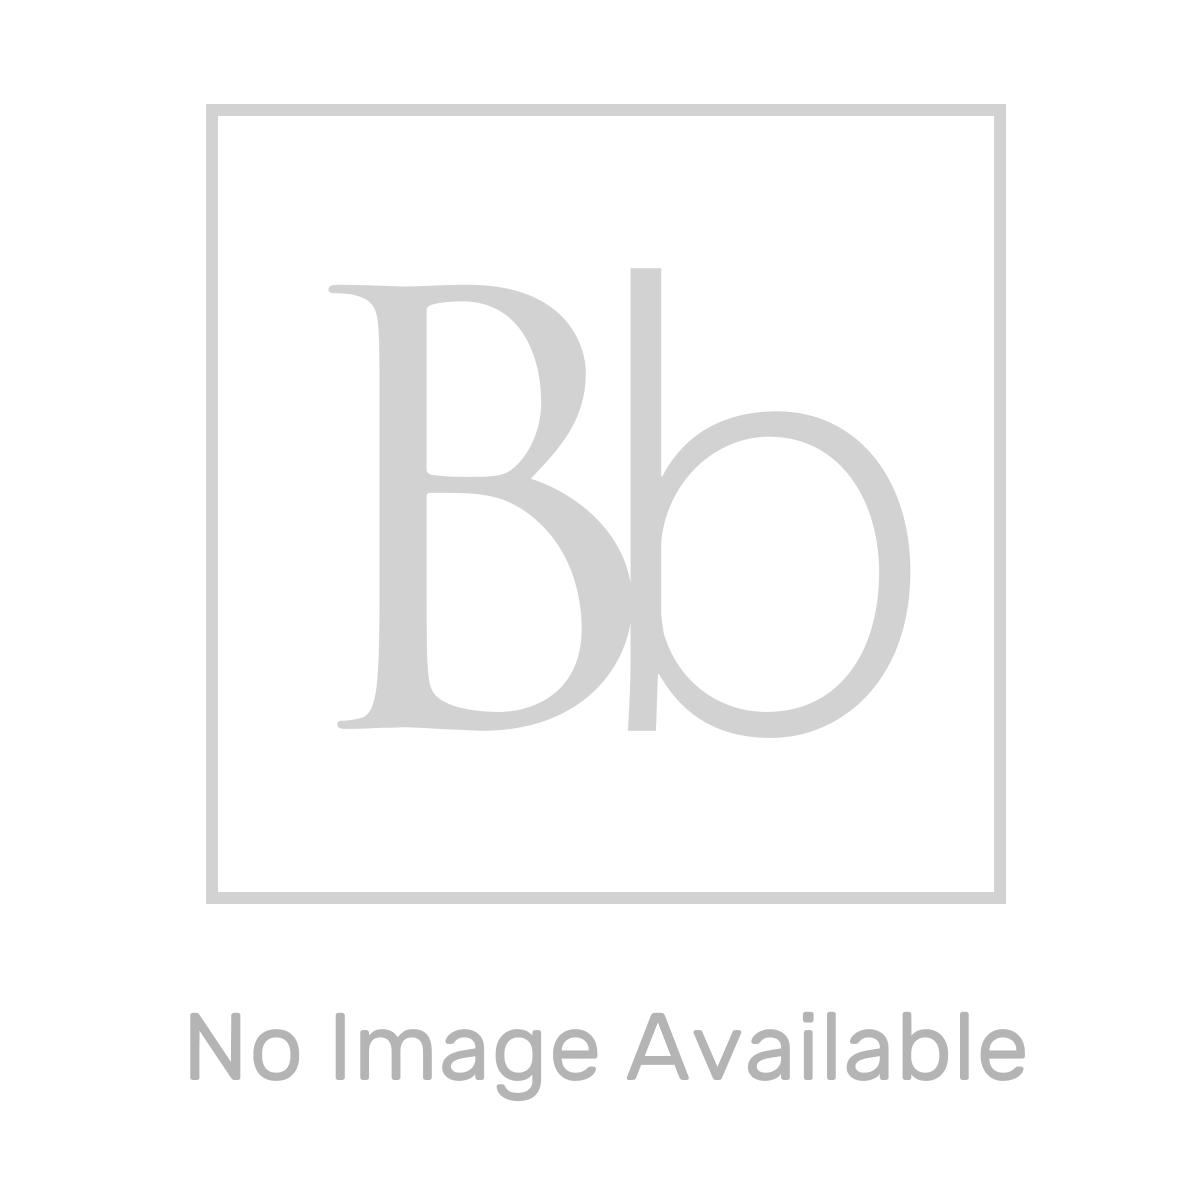 Bali Graphite Oak Floor Standing Vanity Unit 600mm Lifestyle